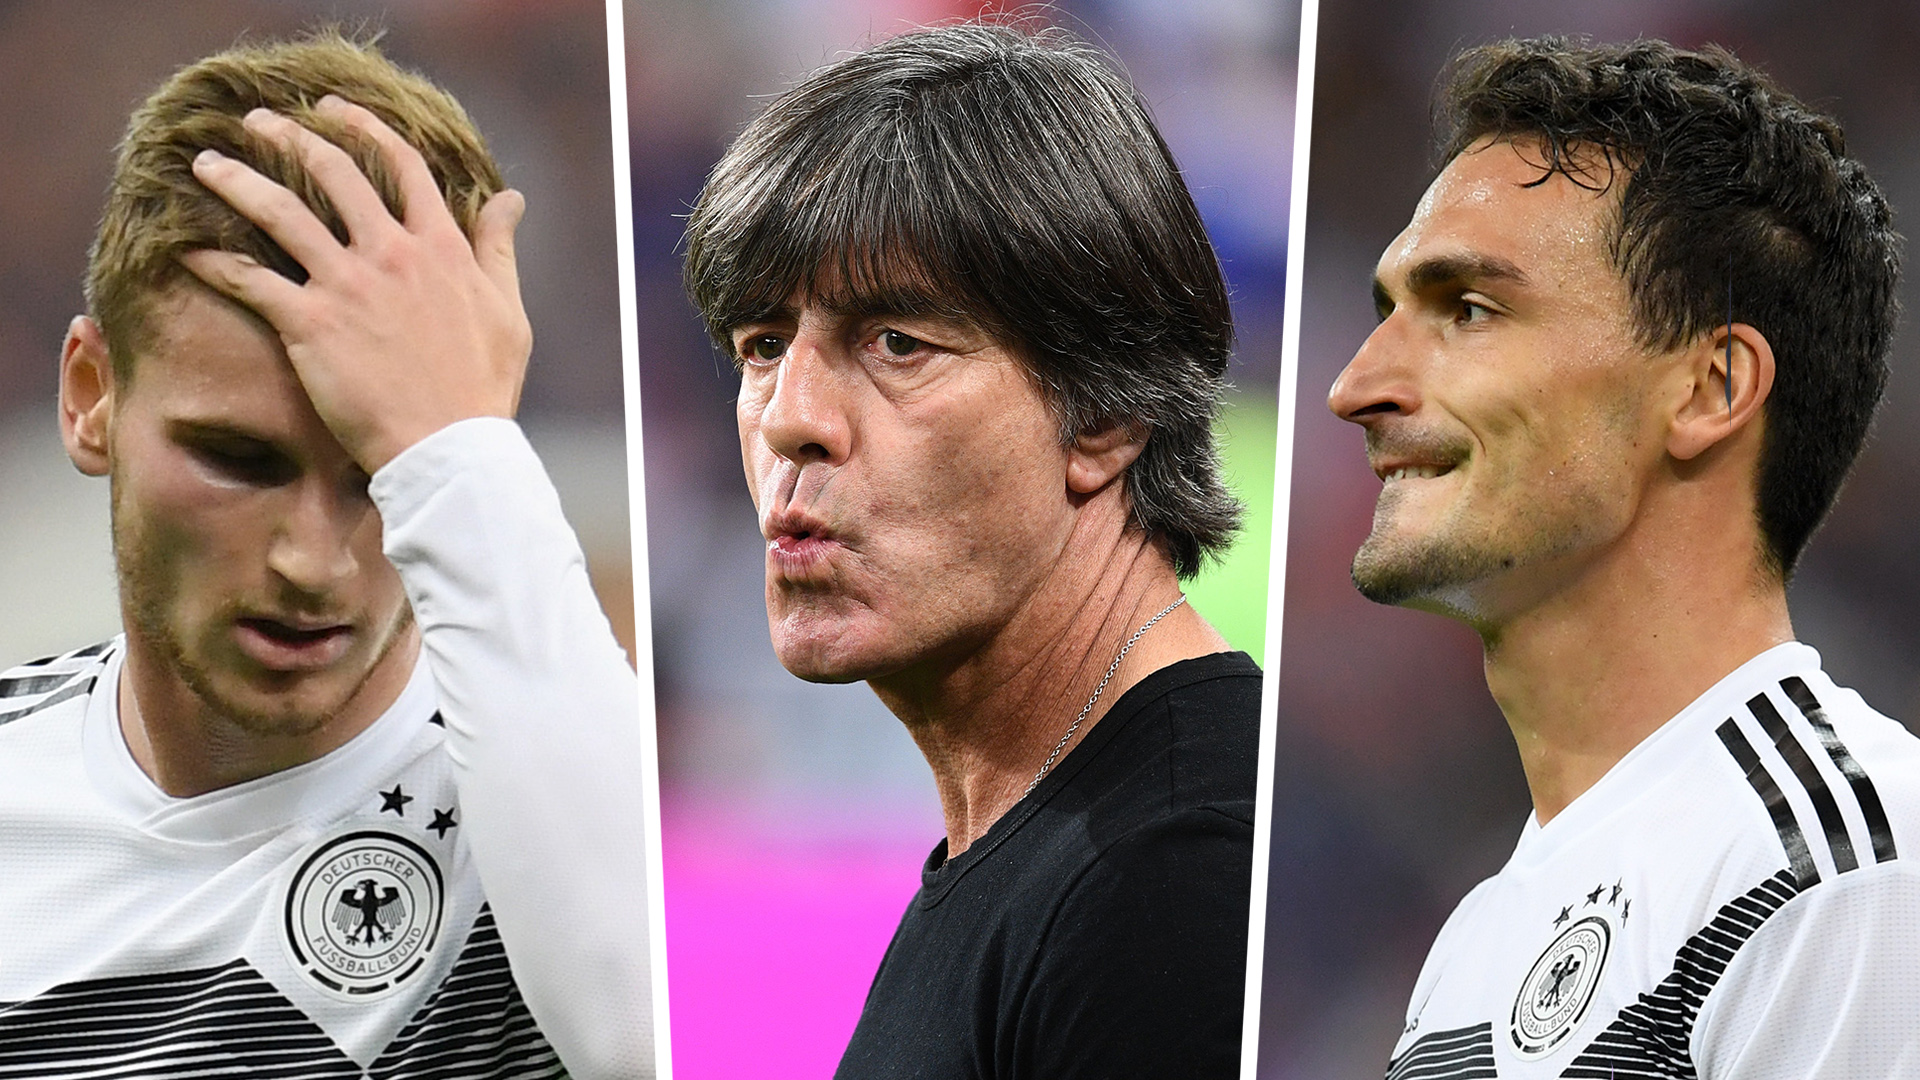 Timo Werner Joachim Low Mats Hummels Germany 2018